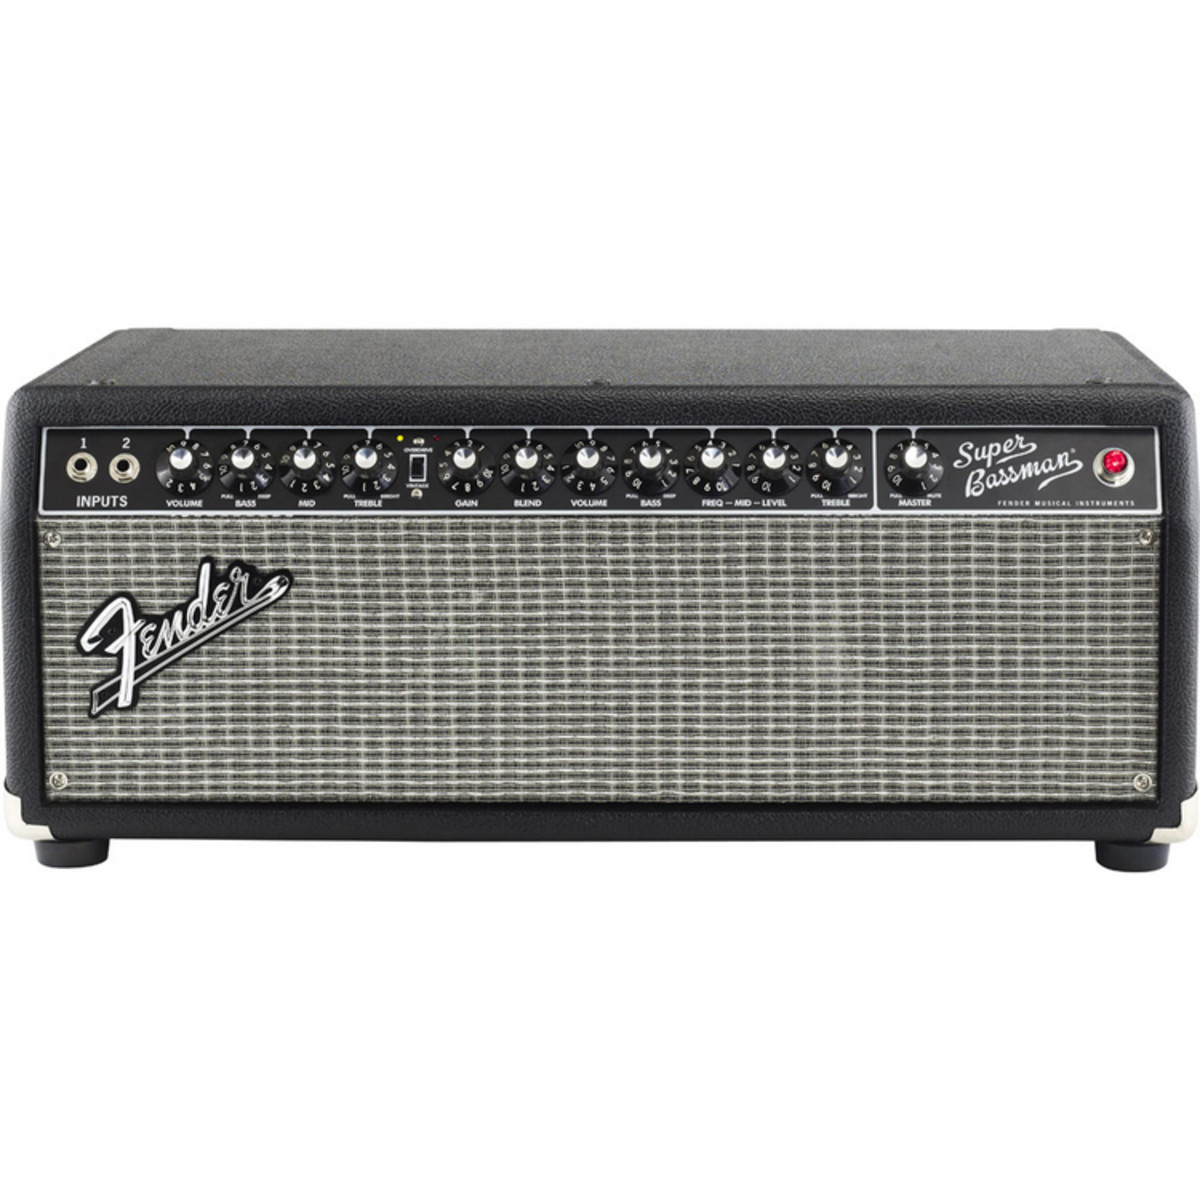 fender super bassman 300w tube amp head at gear4music. Black Bedroom Furniture Sets. Home Design Ideas